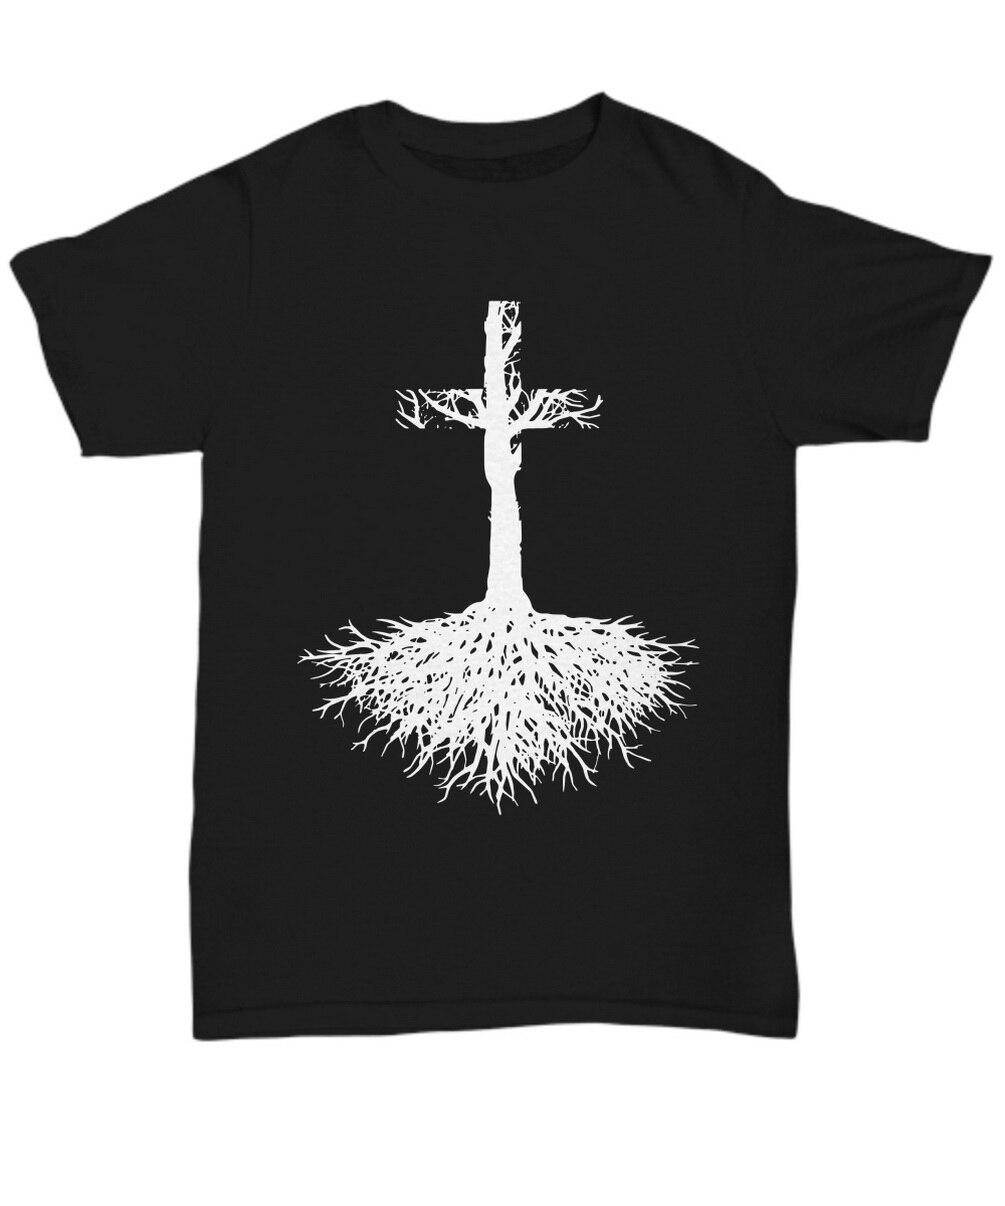 Camiseta de la fe de la raíz cristiana y la cruz cree en la camiseta Unisex de Jesucristo regalos camiseta divertida